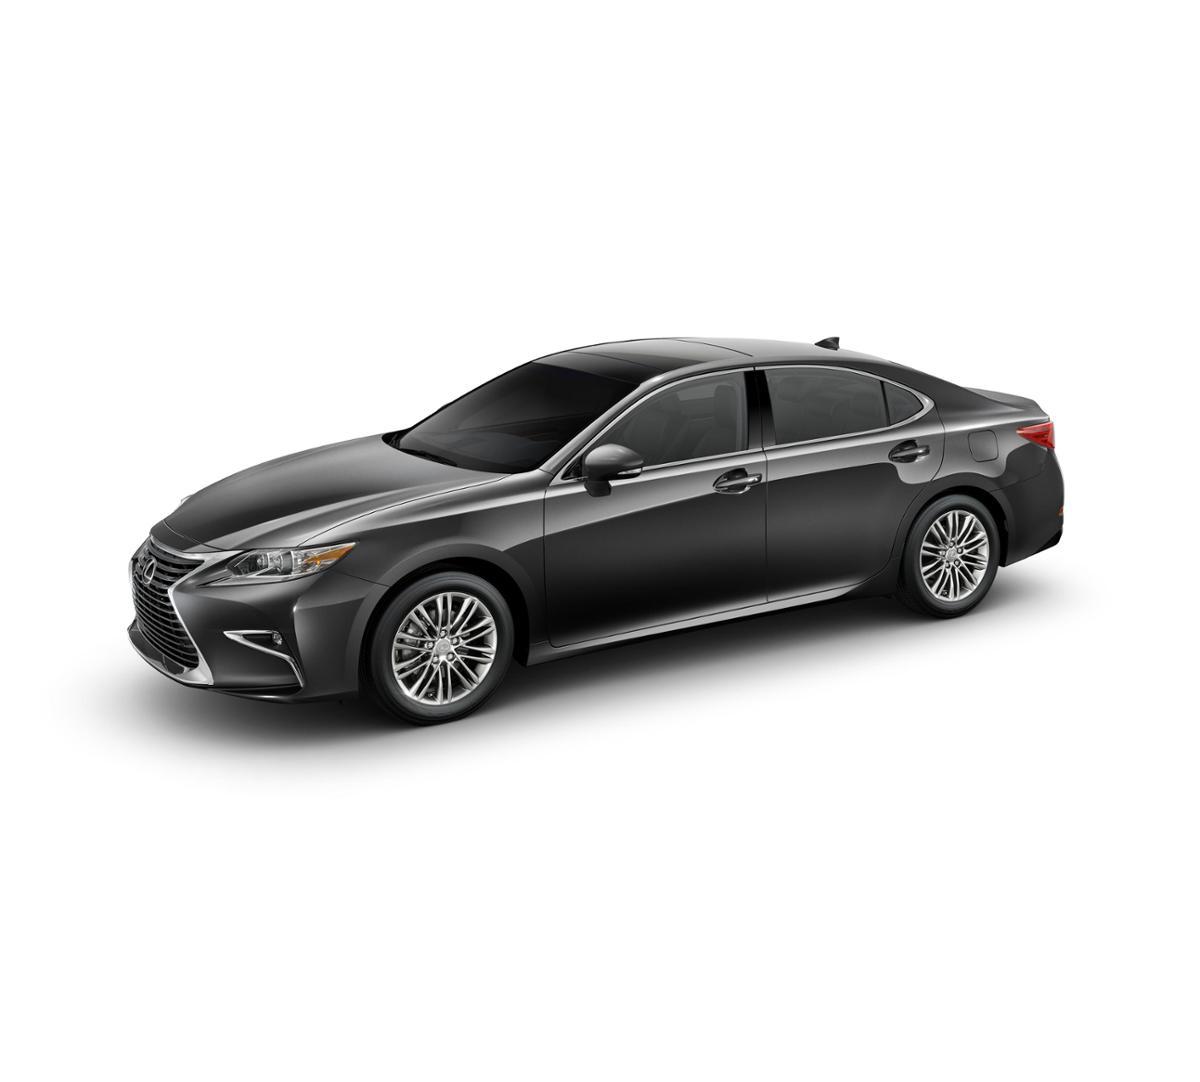 New Acura Dealership In Turnersville: Dallas Certified 2018 Lexus ES 350 Nebula Gray Pearl: Car